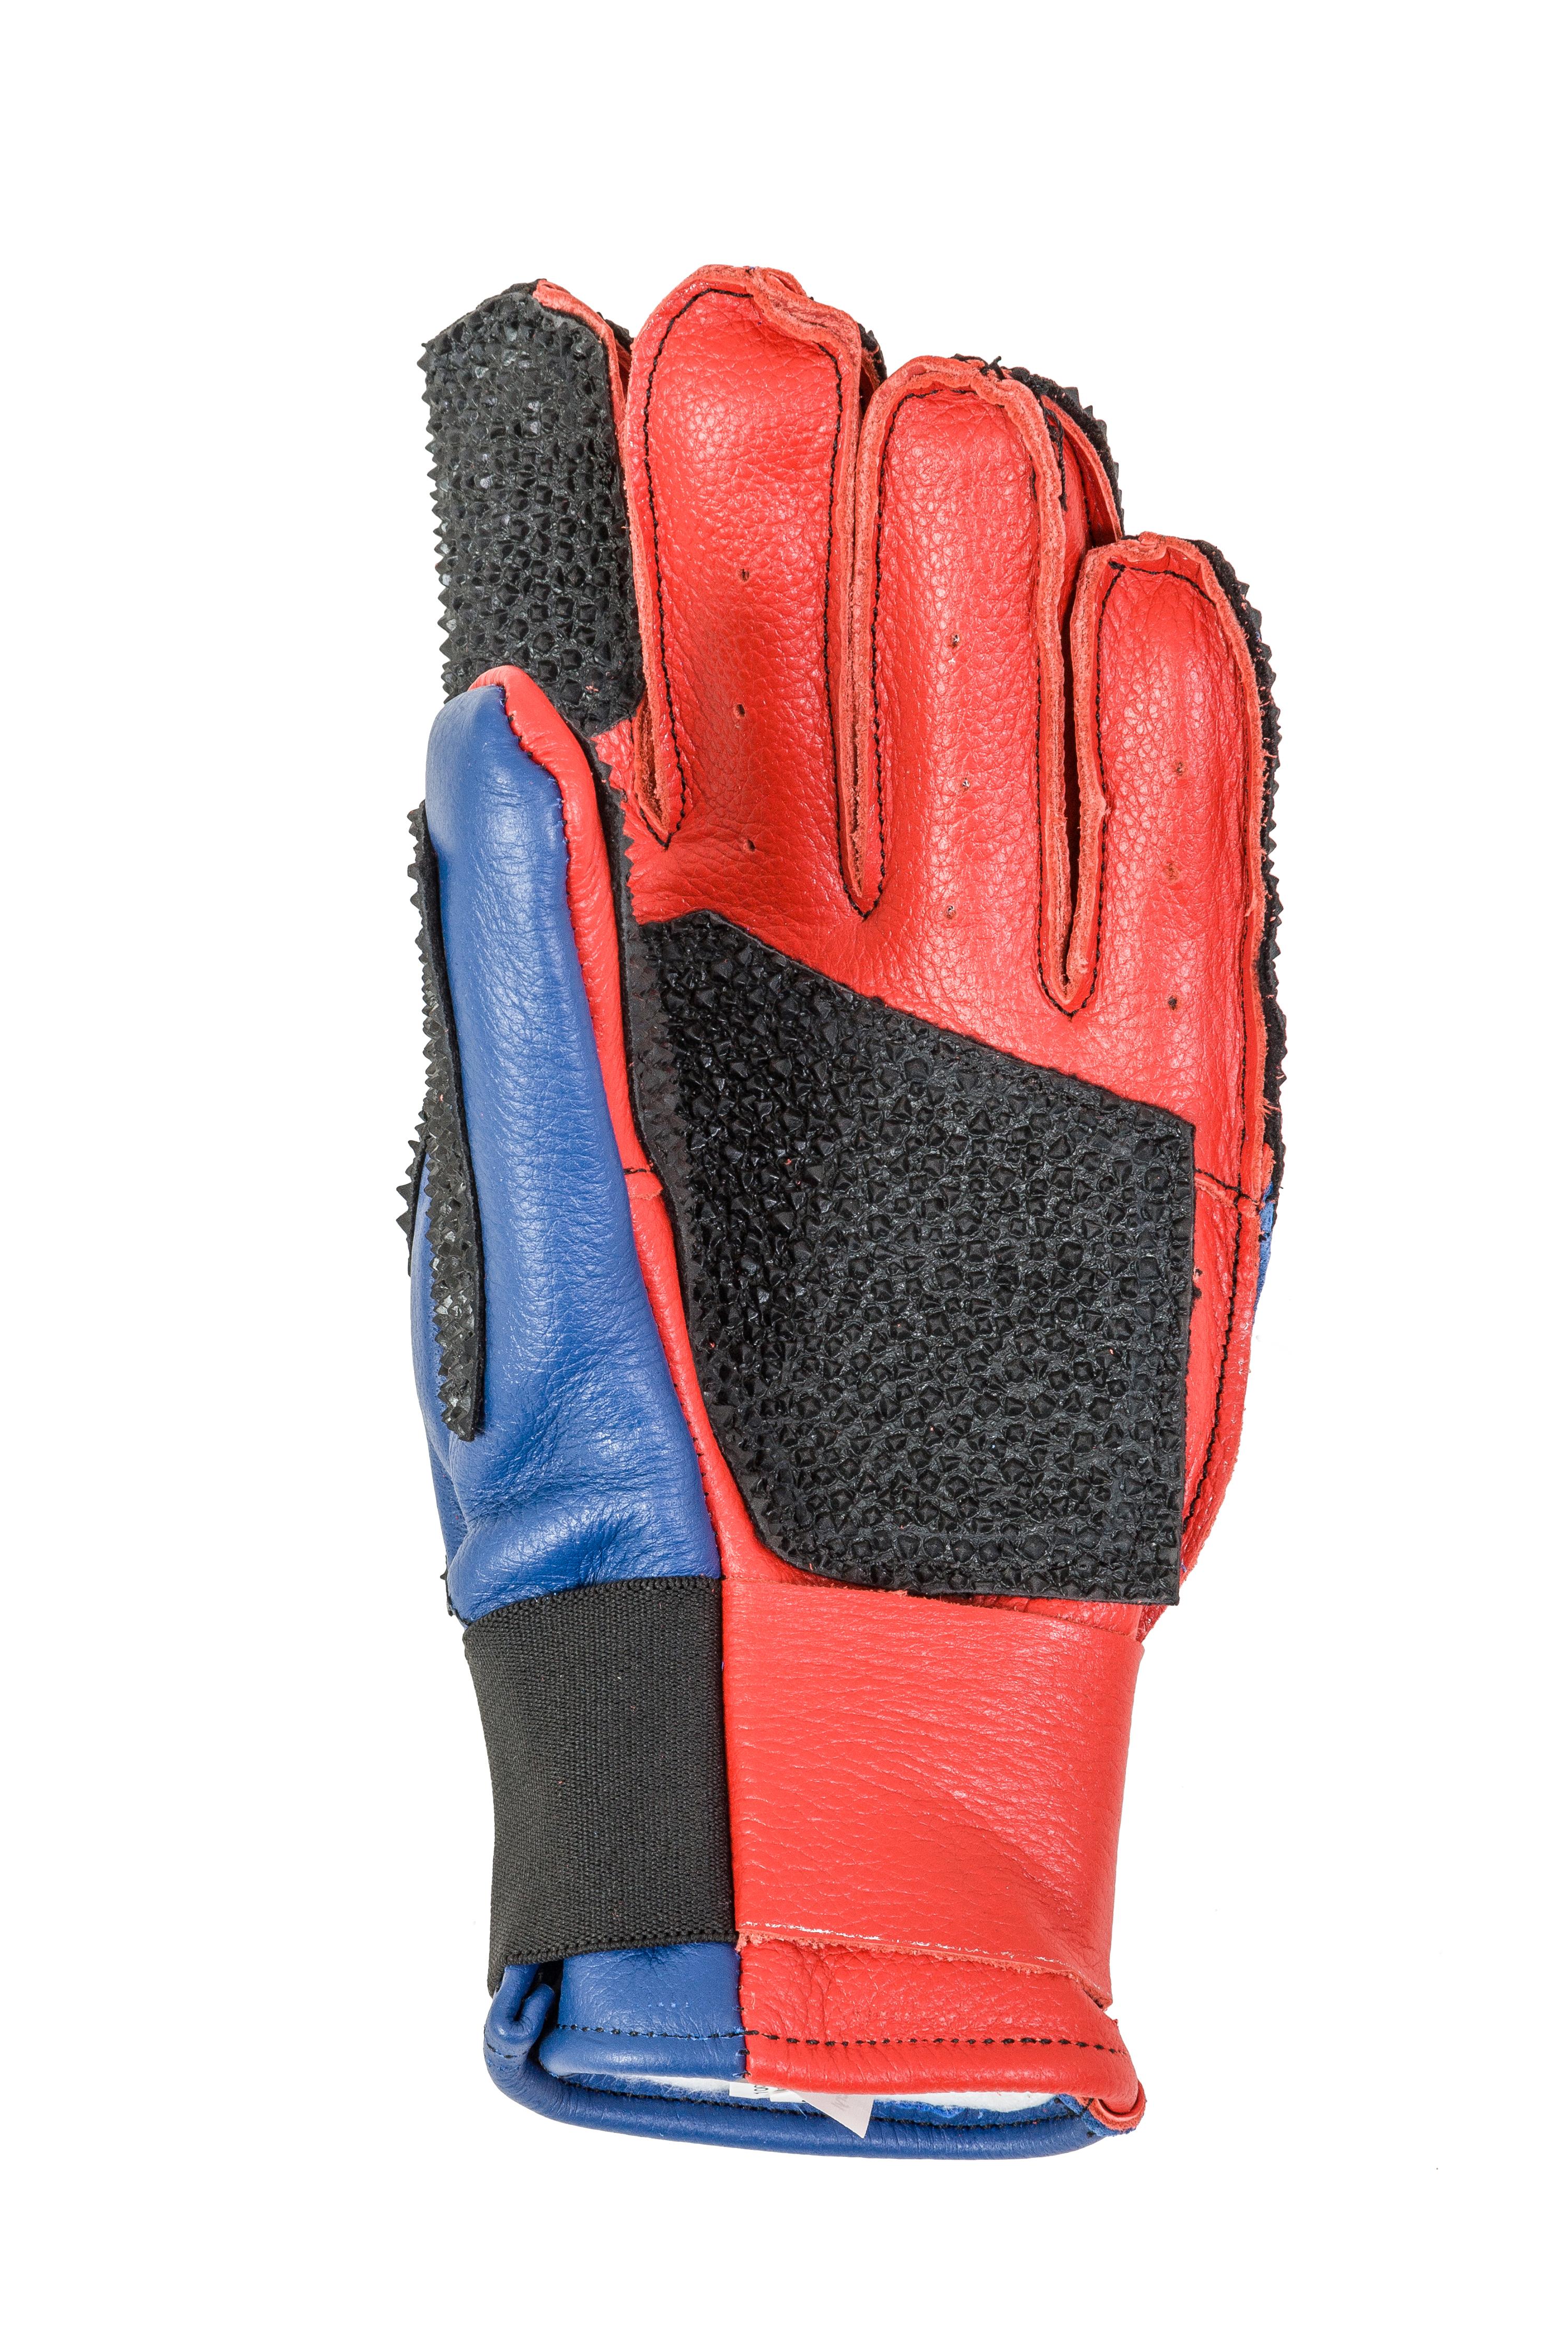 Centaur Standard F full finger padded target shooting glove - palm view - high resolution